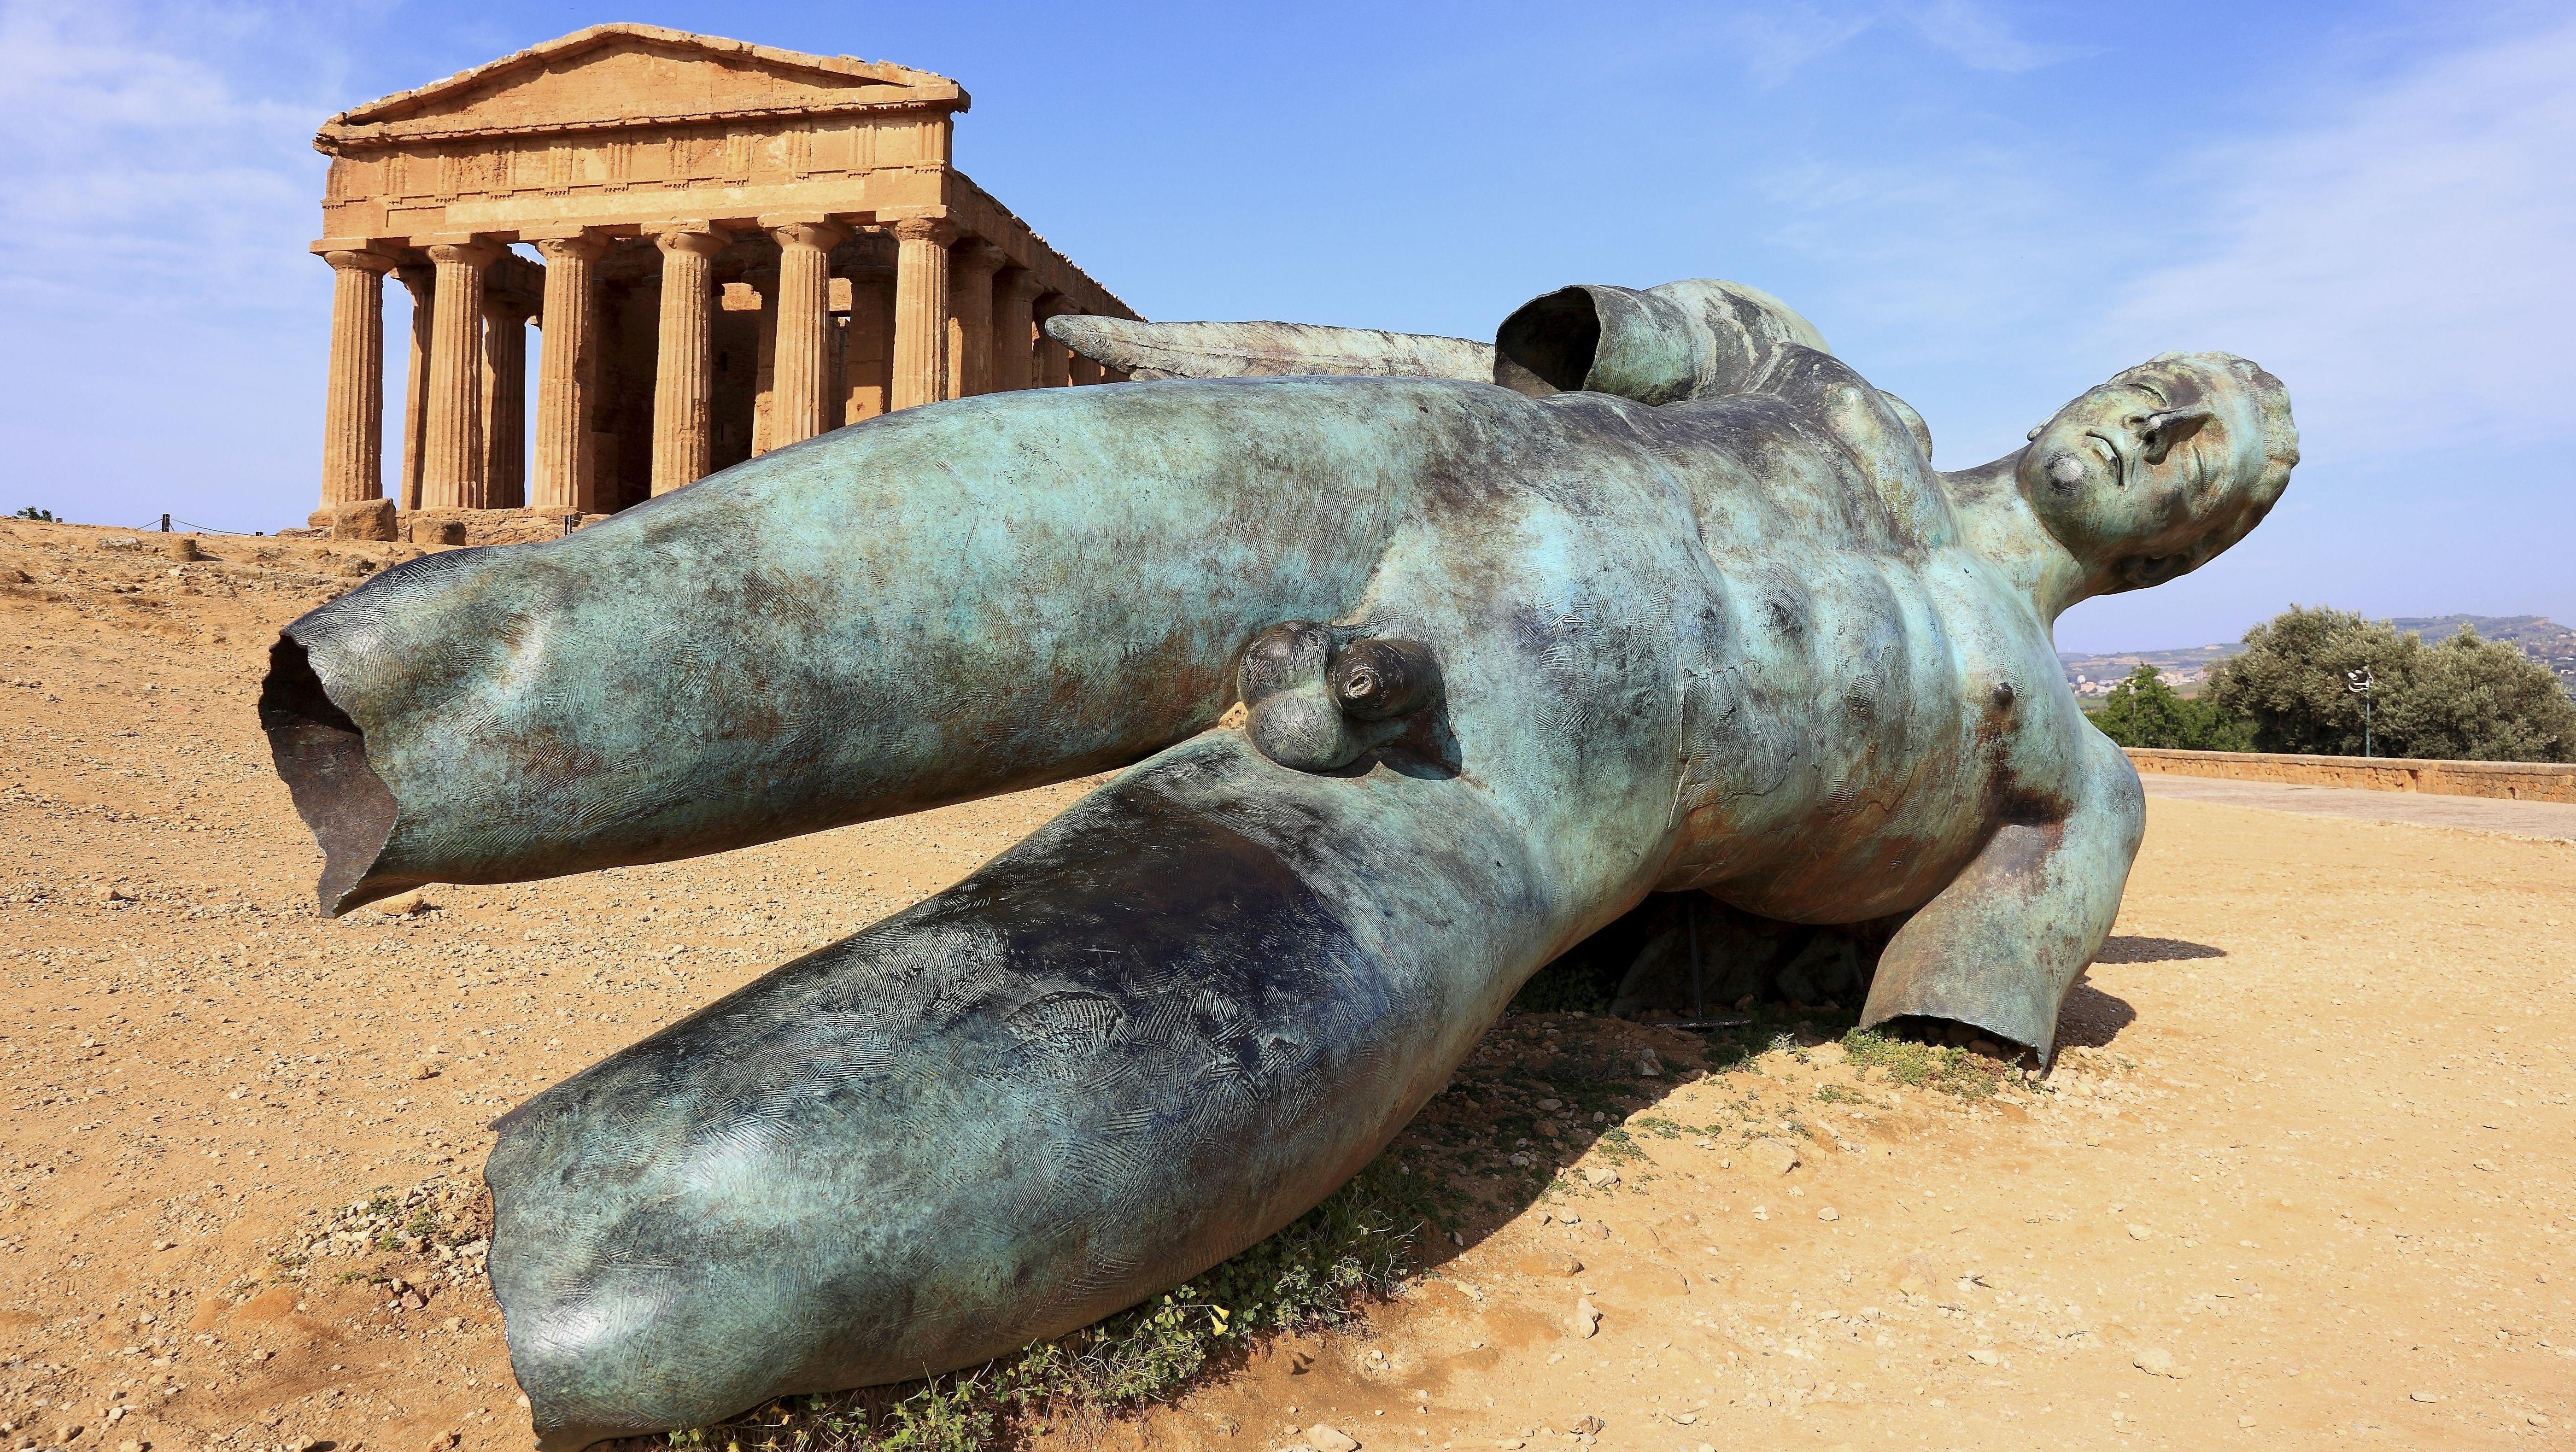 Die Skulptur des abgestürzten Ikarus vor dem Concordia-Tempel in Agrigent, Sizilien